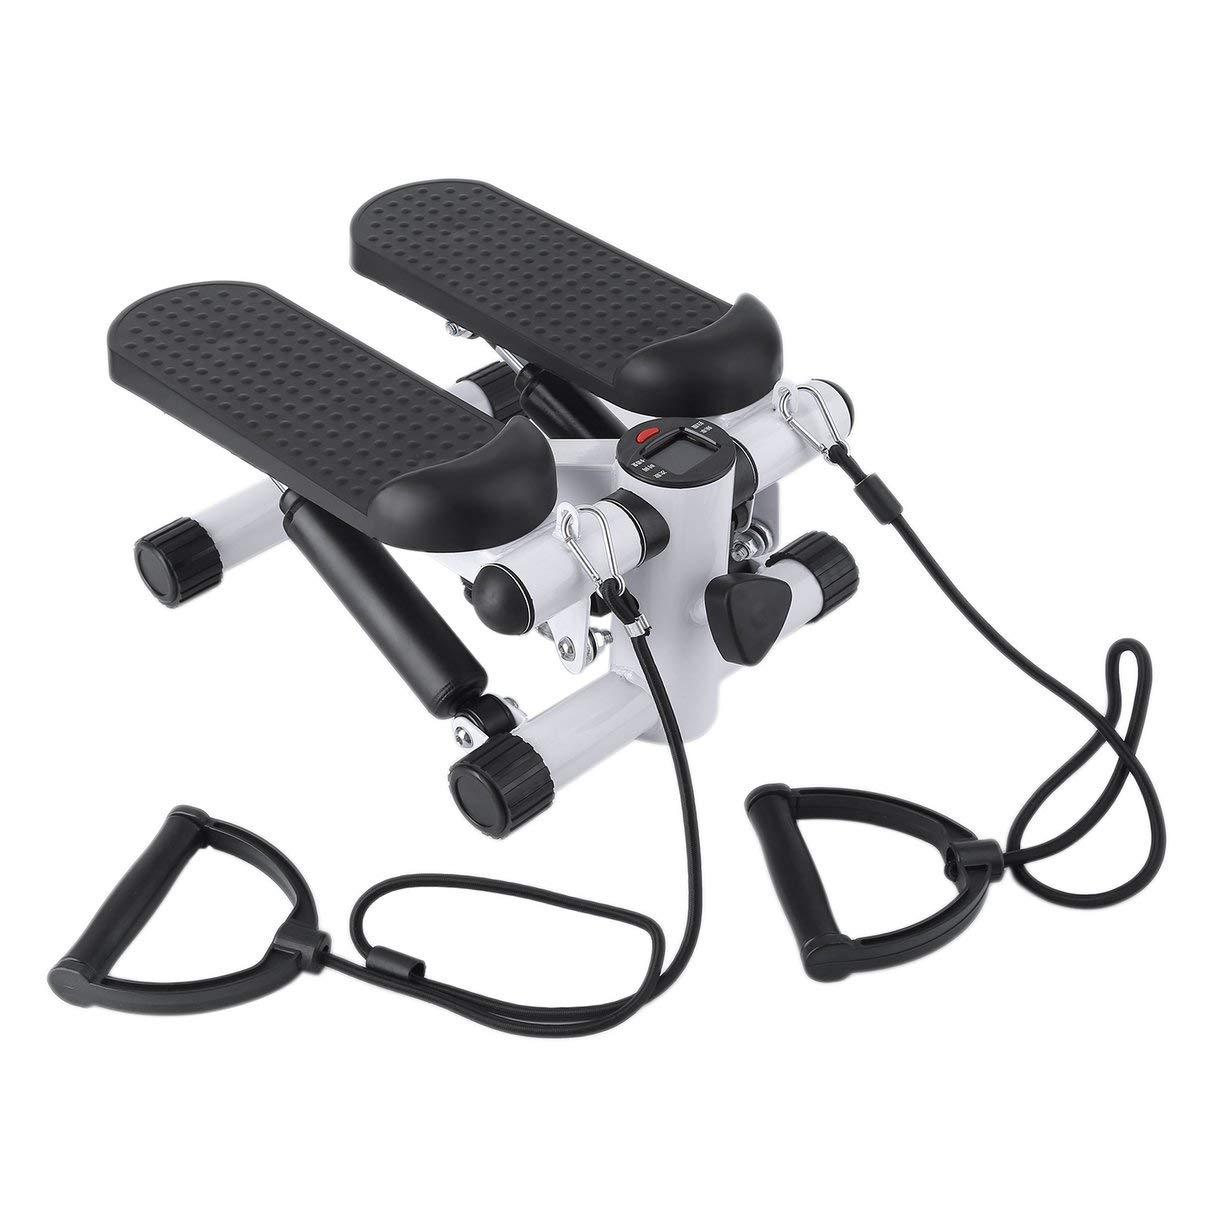 Huldaqueen Household Multifunction Aerobic Fitness Step Air Stair Climber Stepper Exercise Machine Equipment Mini Treadmill